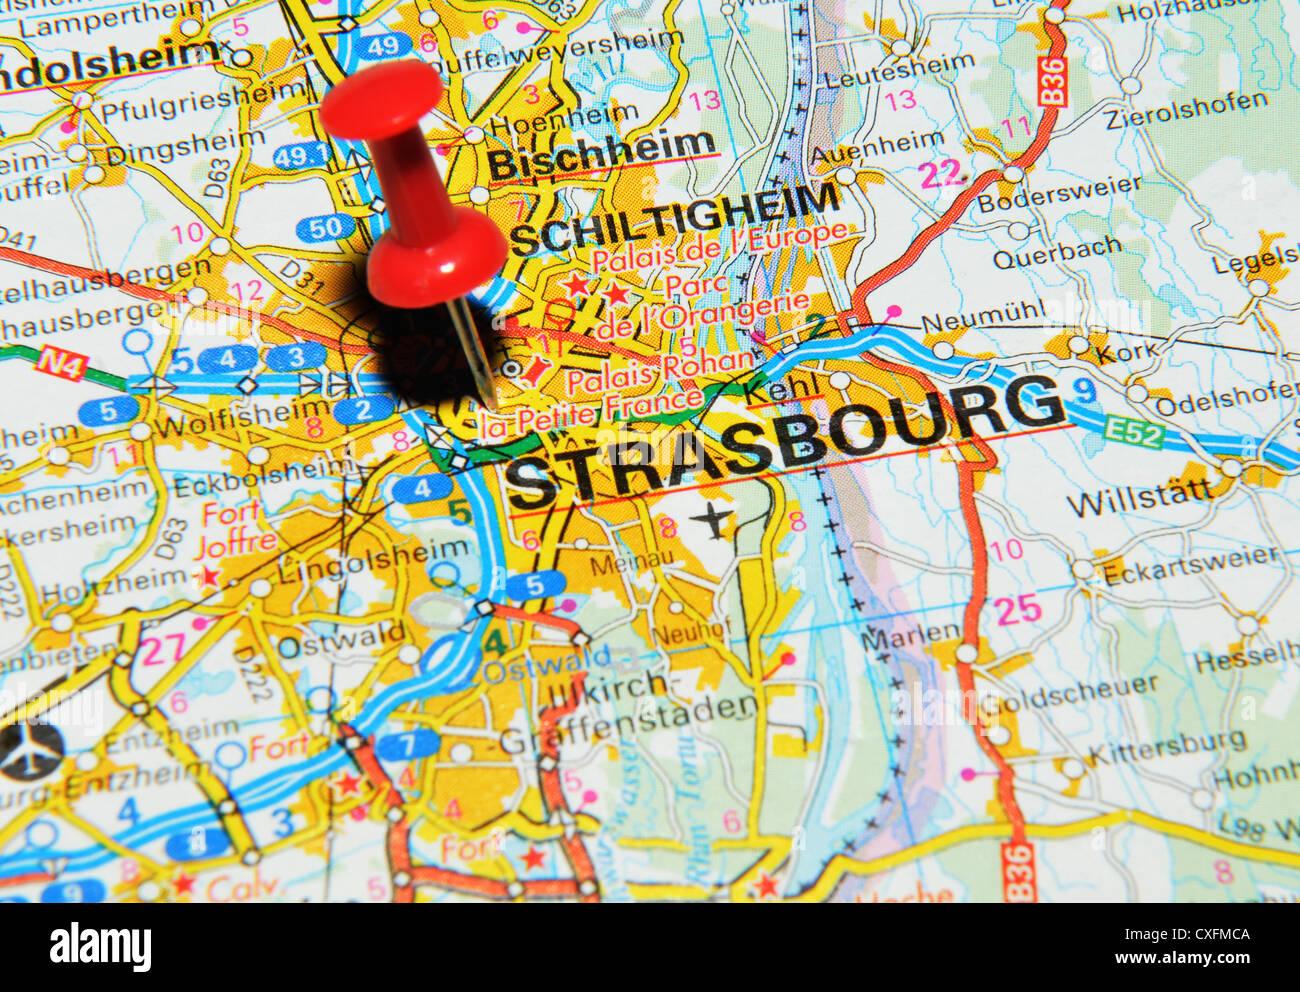 Strasbourg France On Map Stock Photo 50747098 Alamy